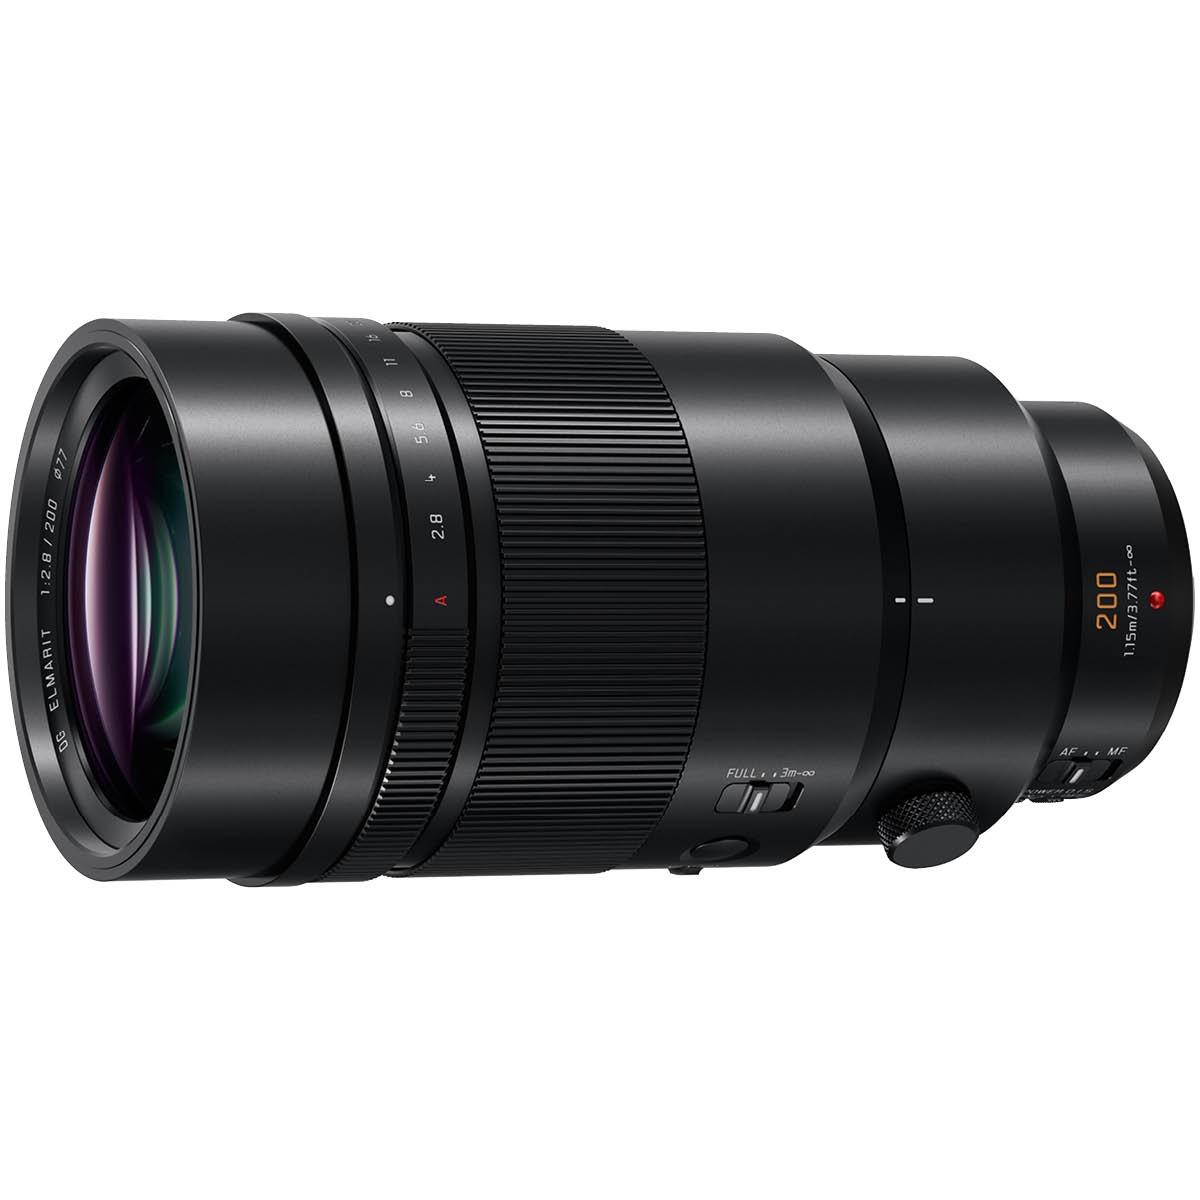 Panasonic 200 mm 1:2,8 Leica DG Elmarit ASPH OIS